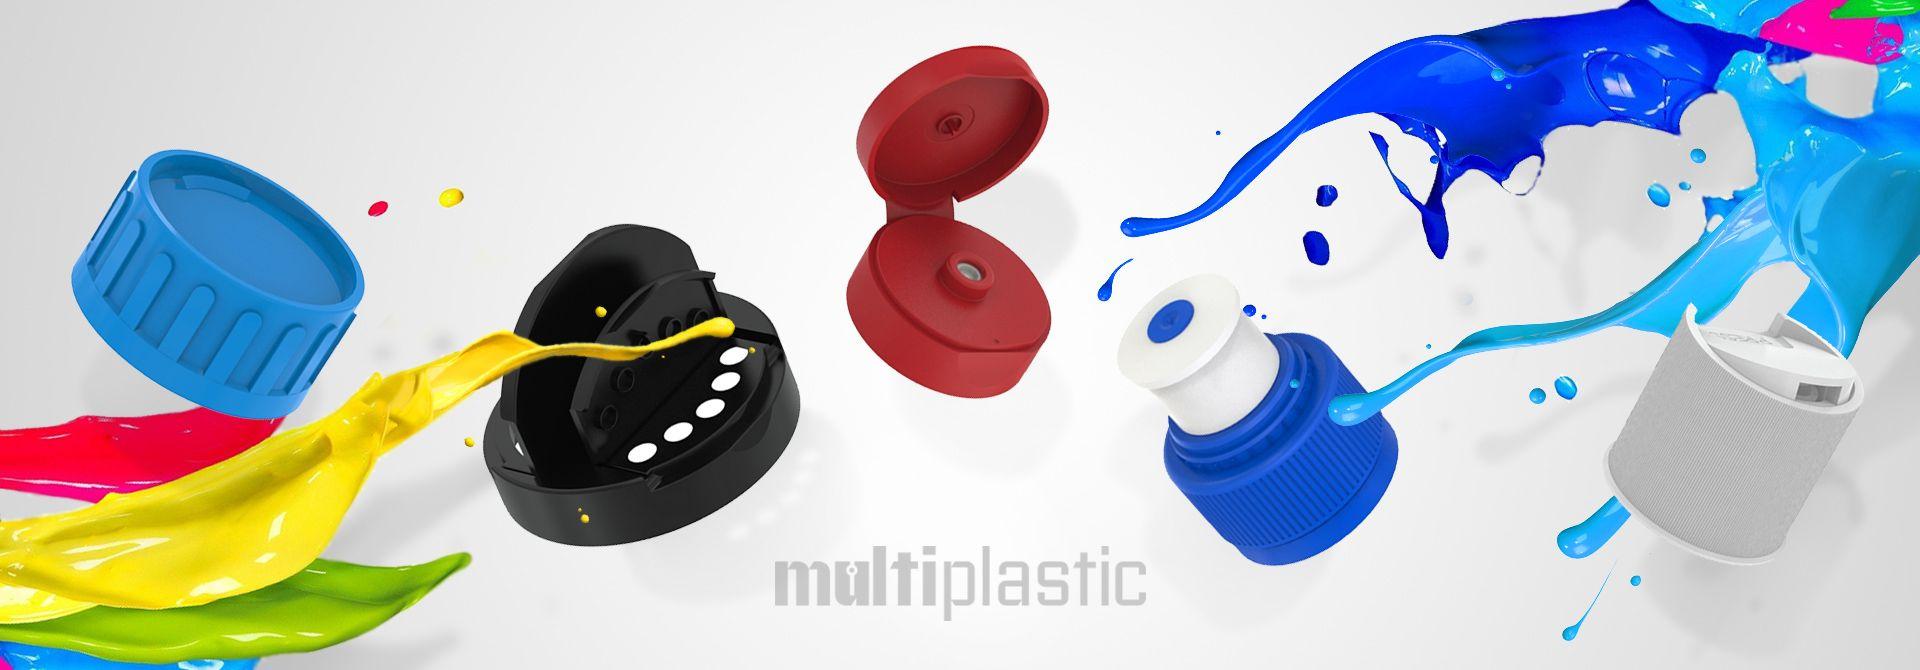 banner-multiplastic